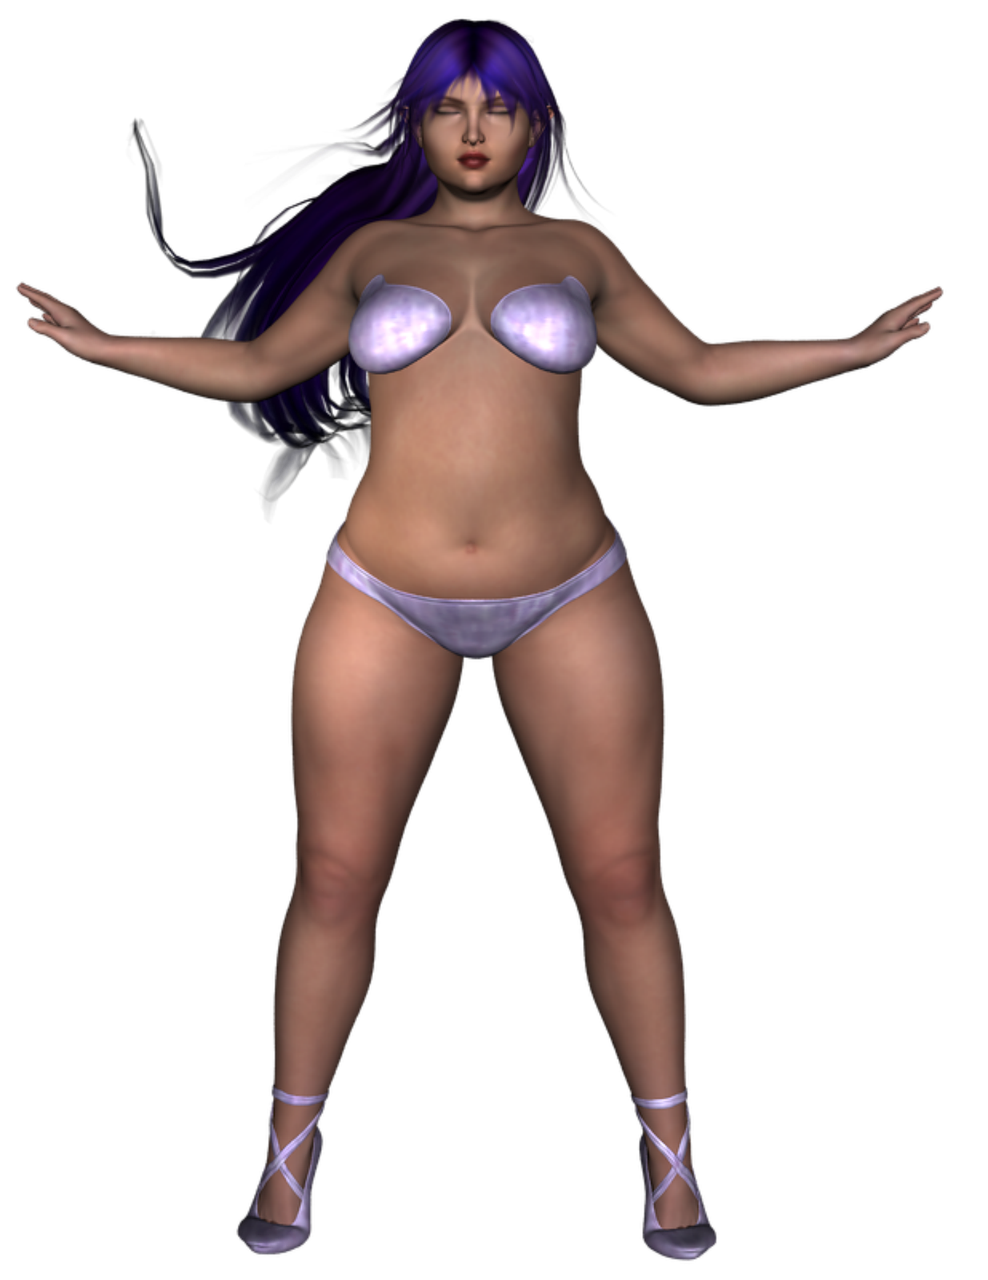 Mujeres Bbw mujer sobrepeso gordito - imagen gratis en pixabay